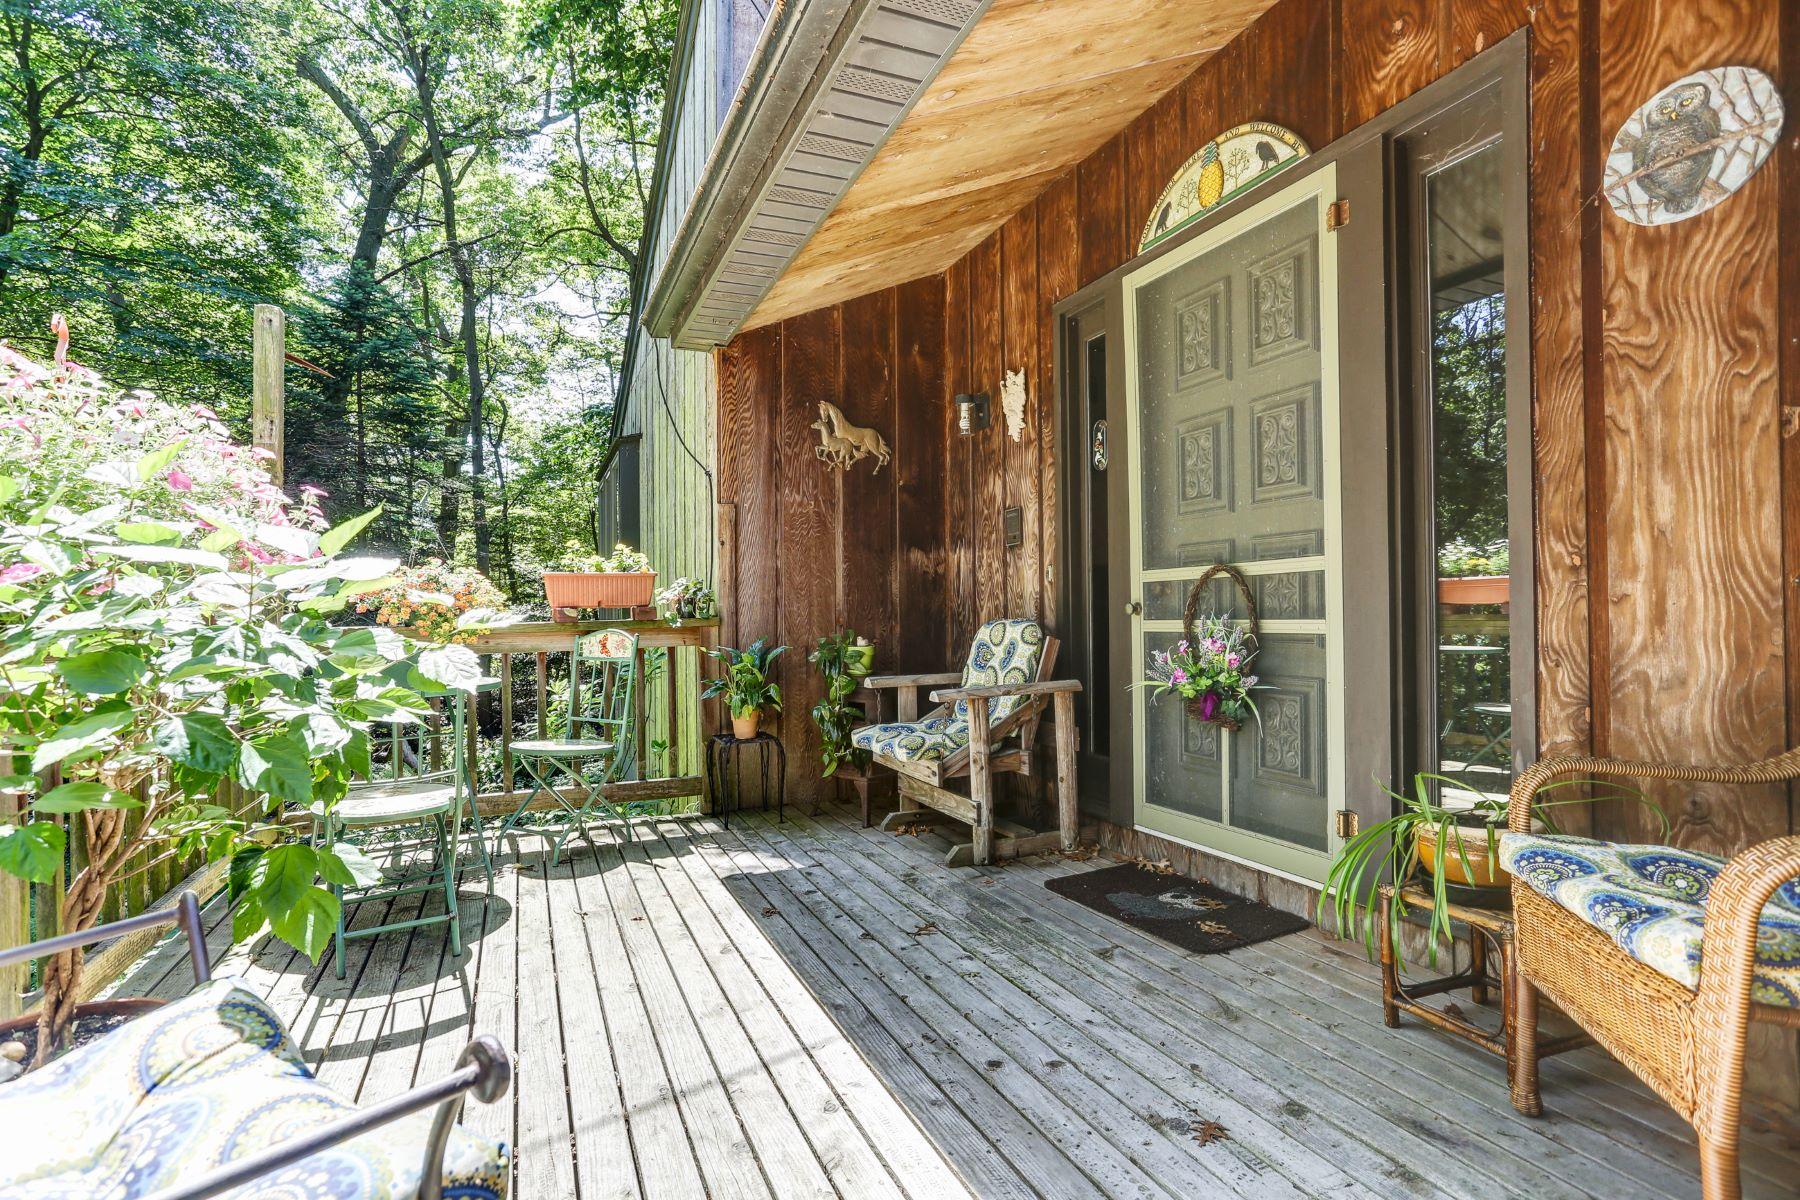 Property 为 销售 在 大西洋高地, 新泽西州 07716 美国